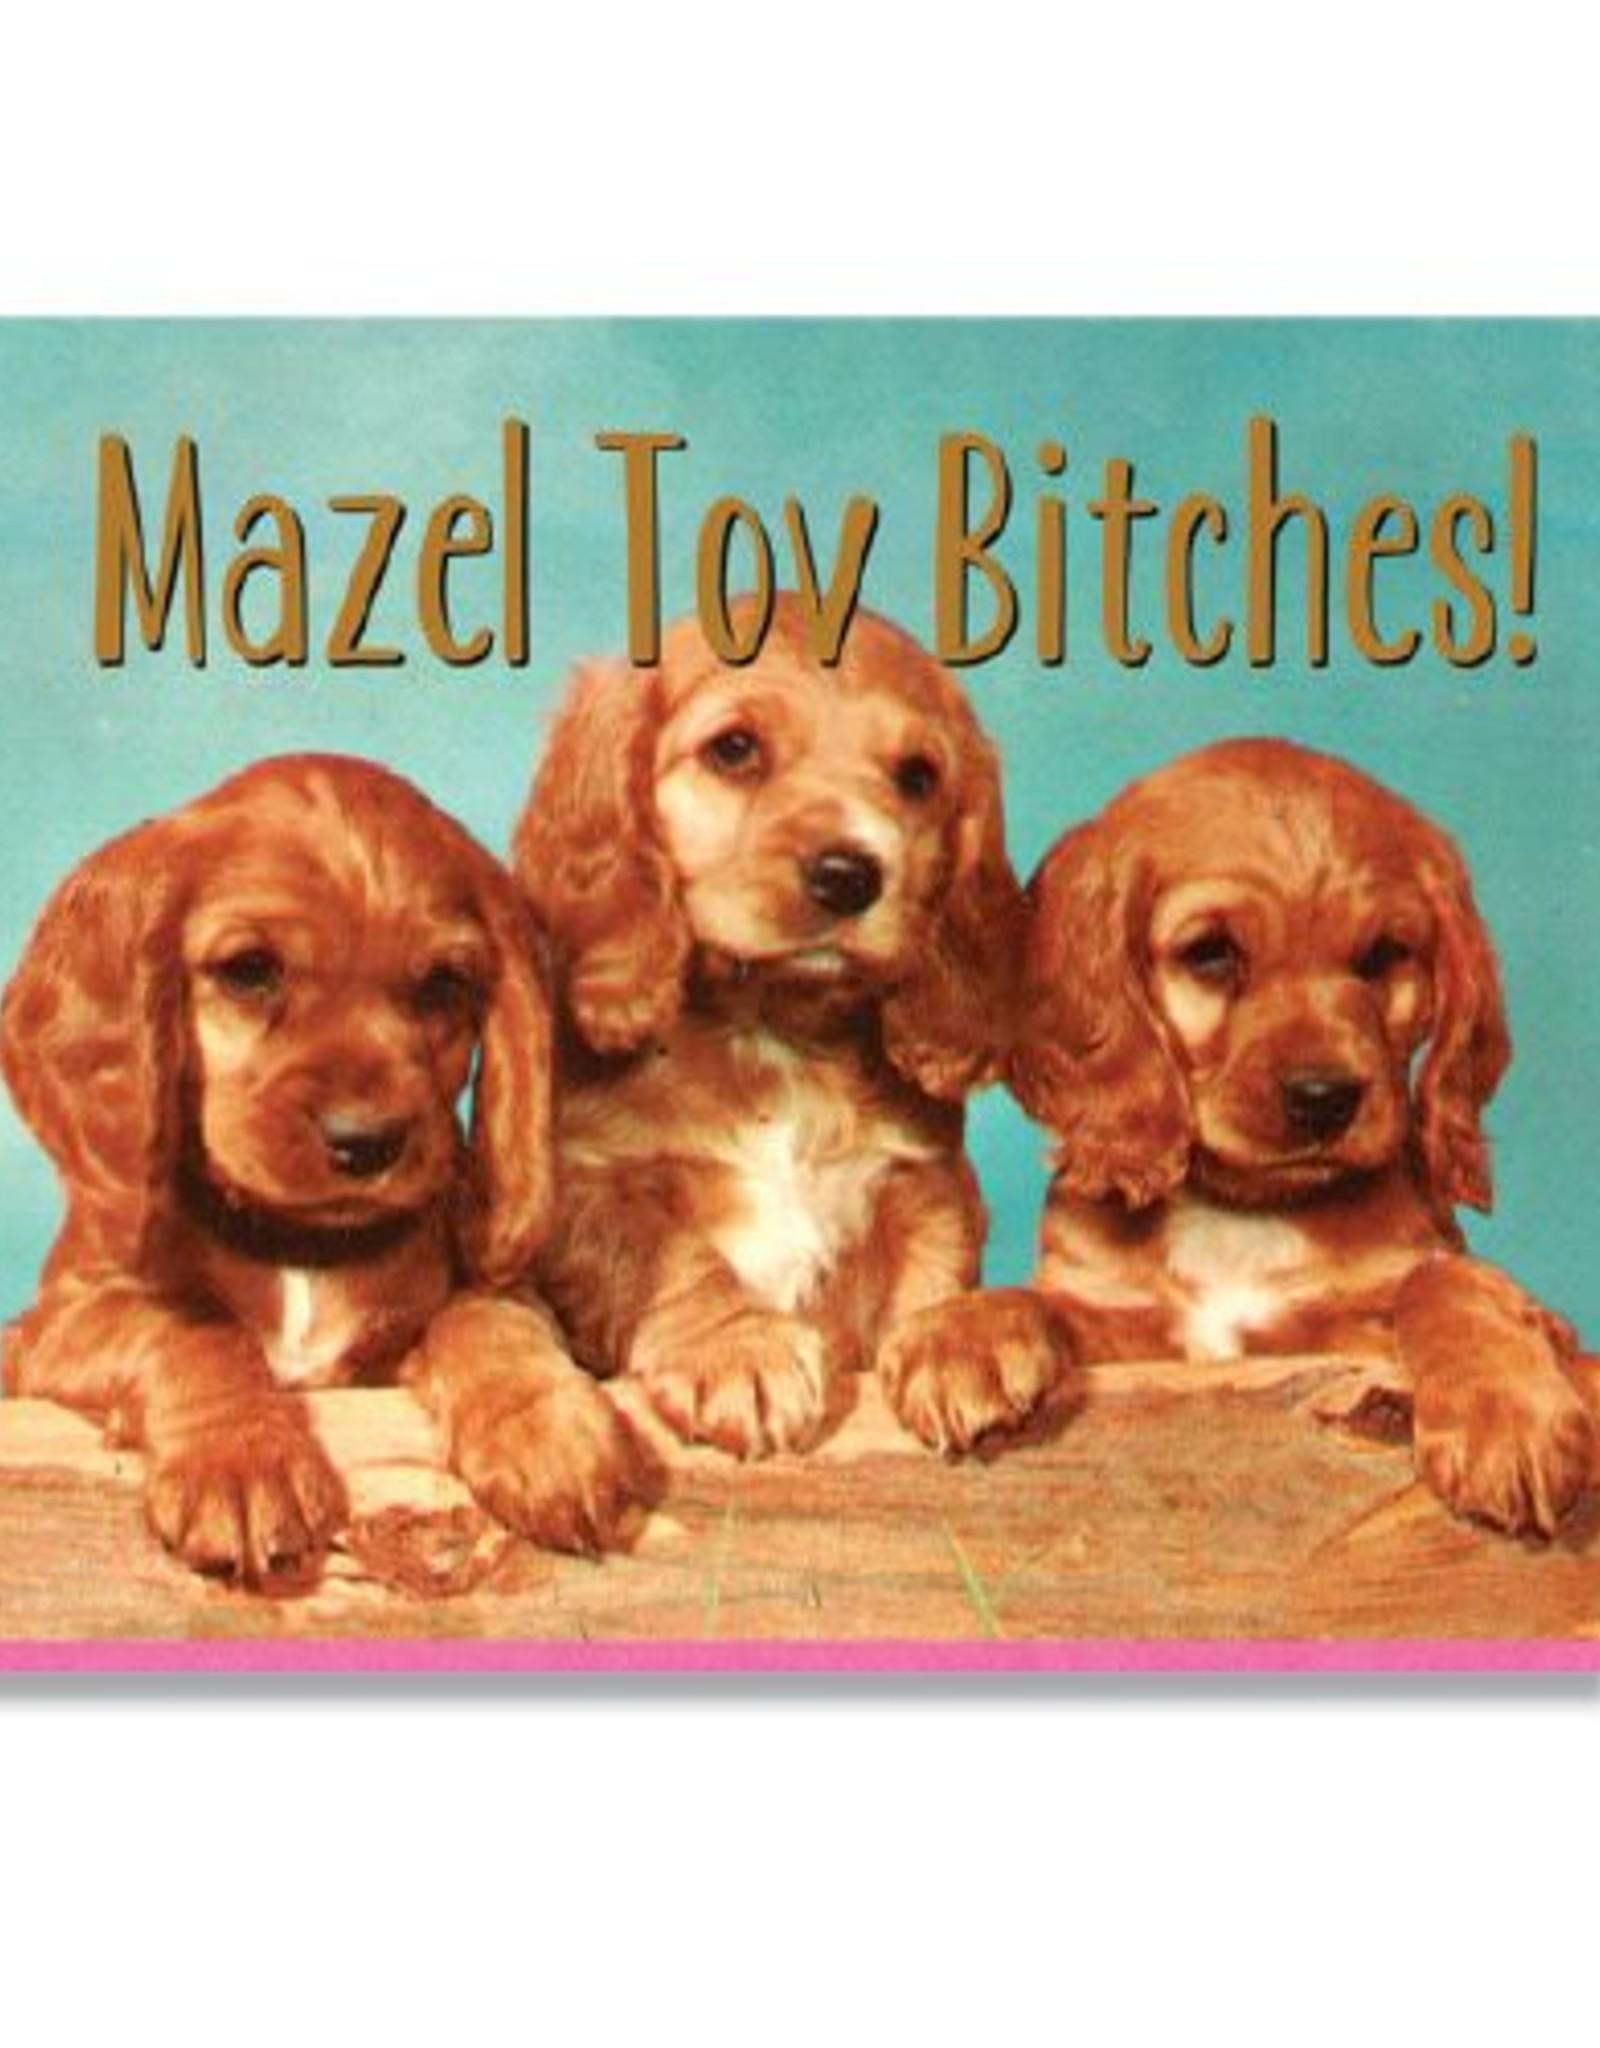 Mazel Tov Bitches! Greeting Card